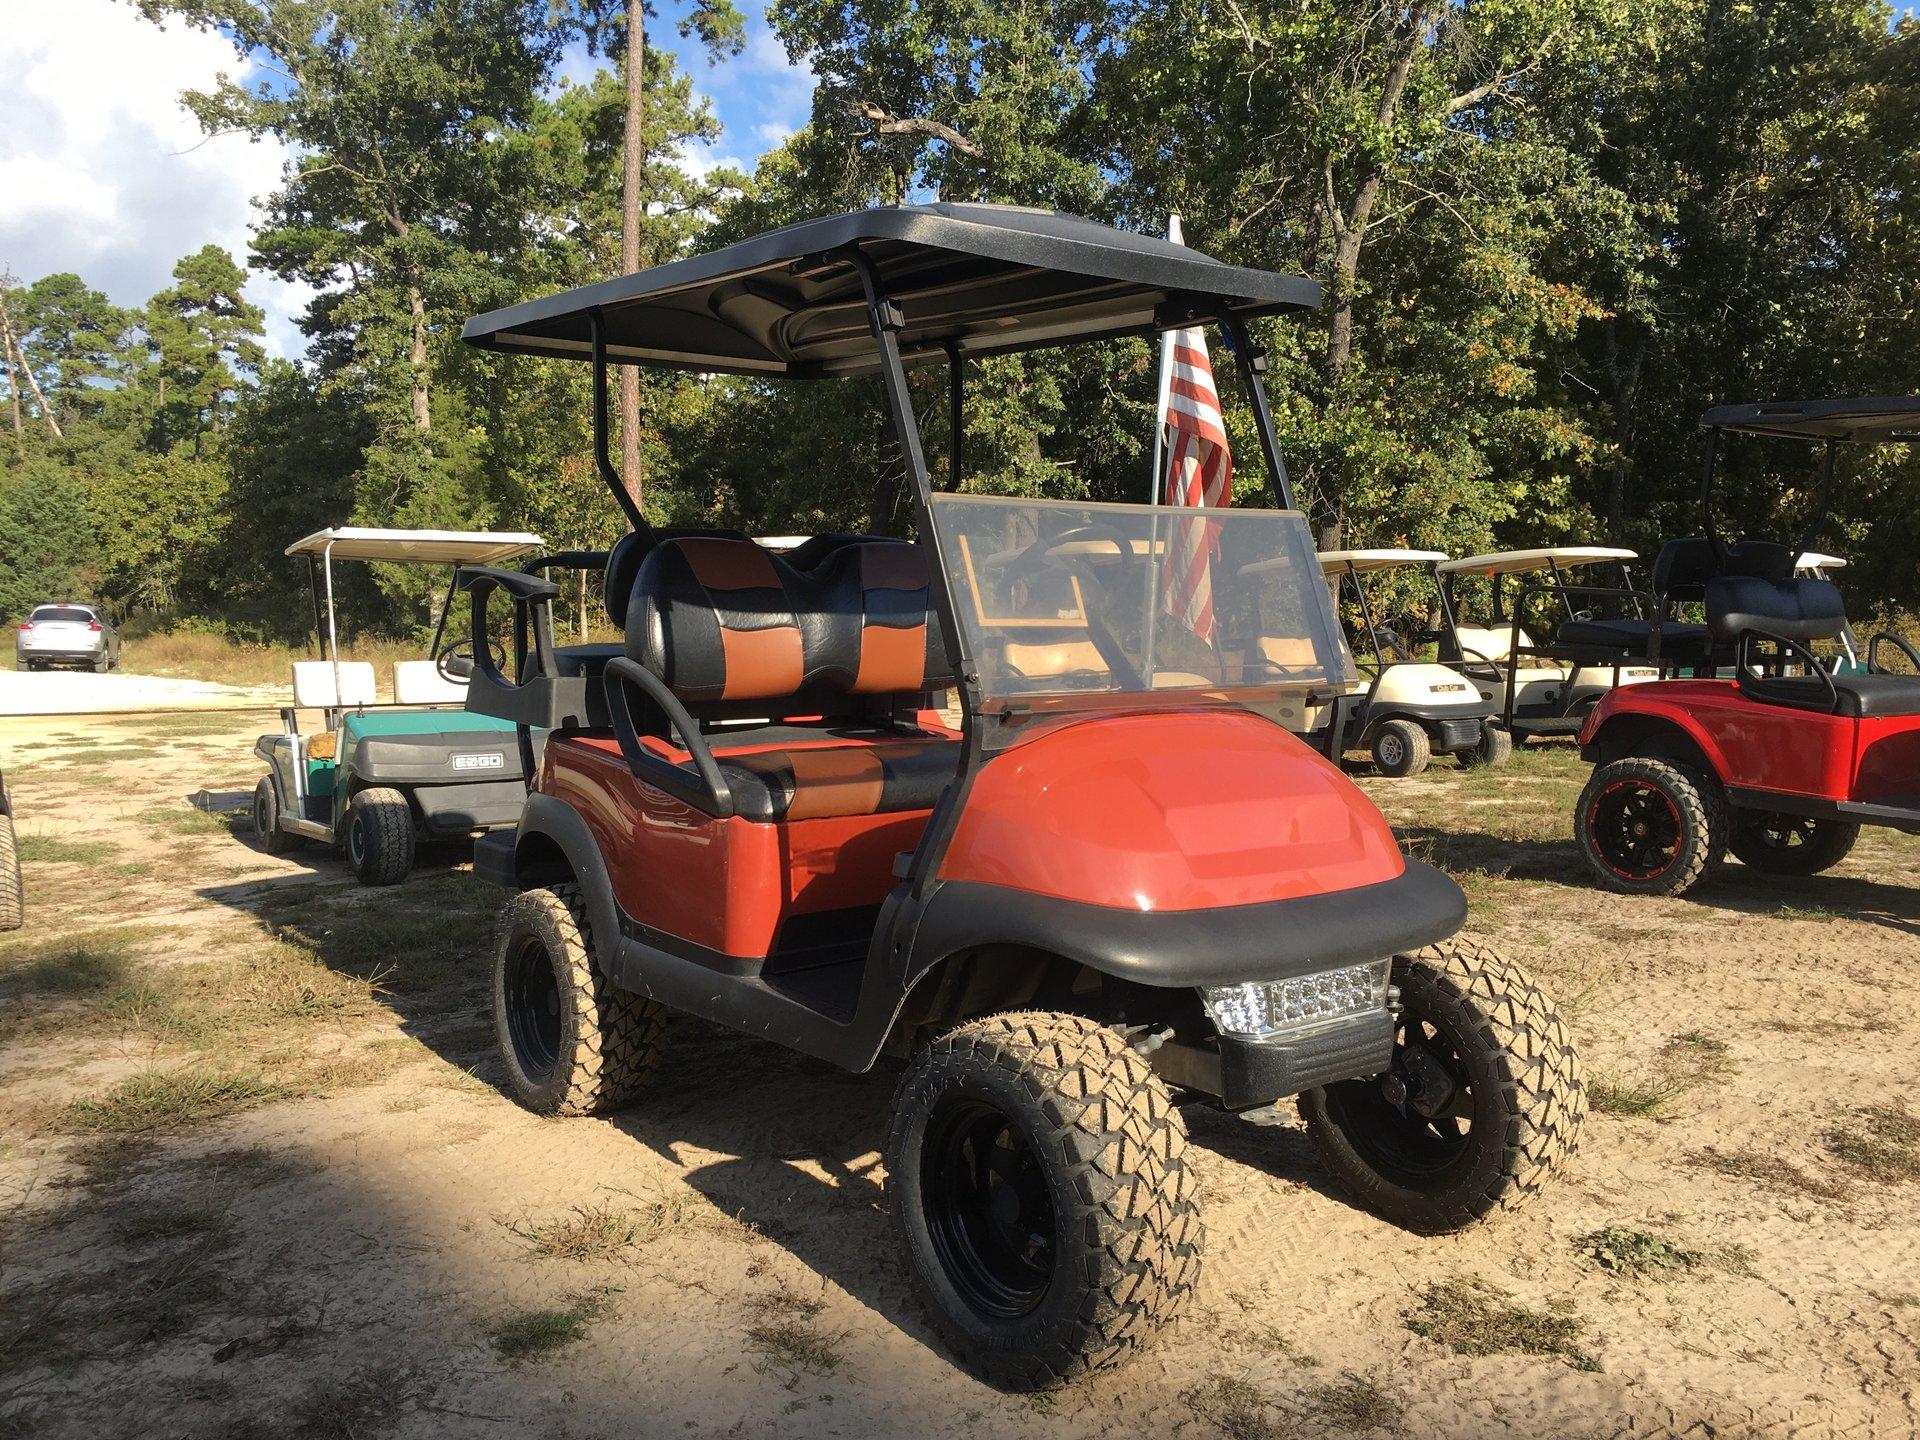 lift kit for golf cart. view all lift kit for golf cart